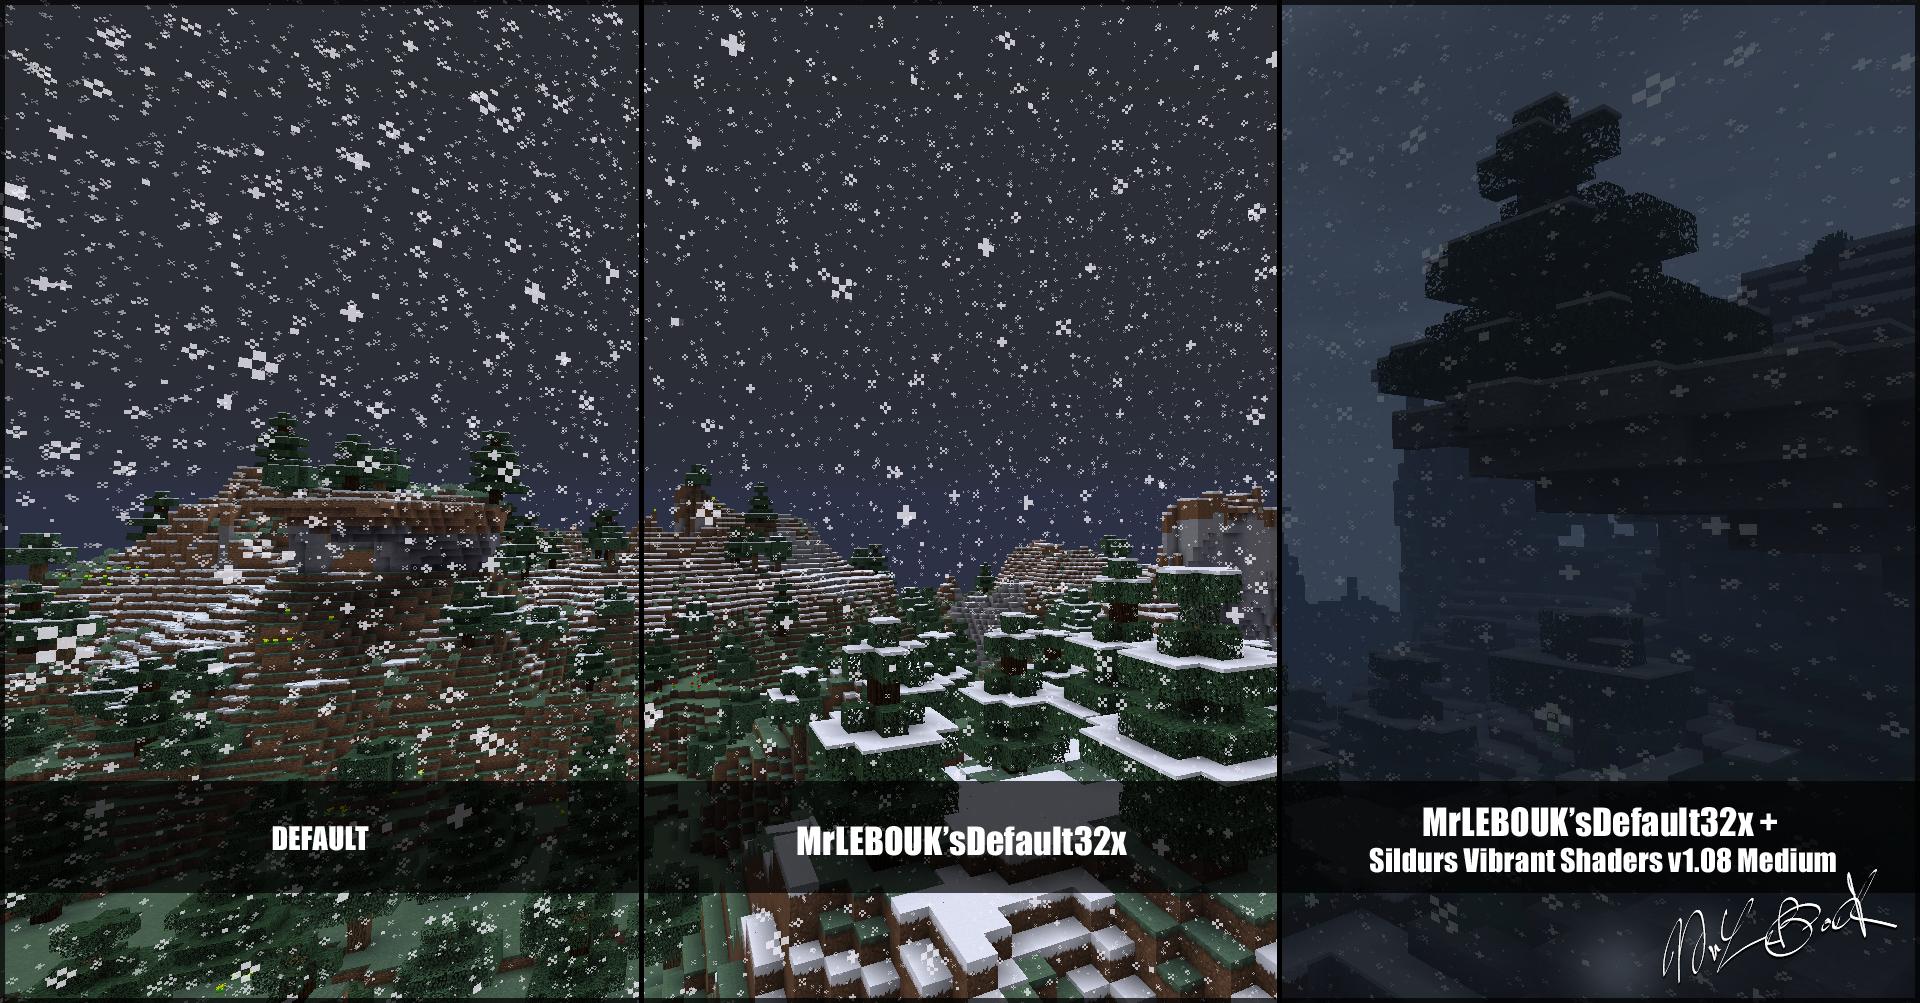 Neige et forêt de sapin : Resource pack minecraft MrLEBOUK'SDEFAUT32x